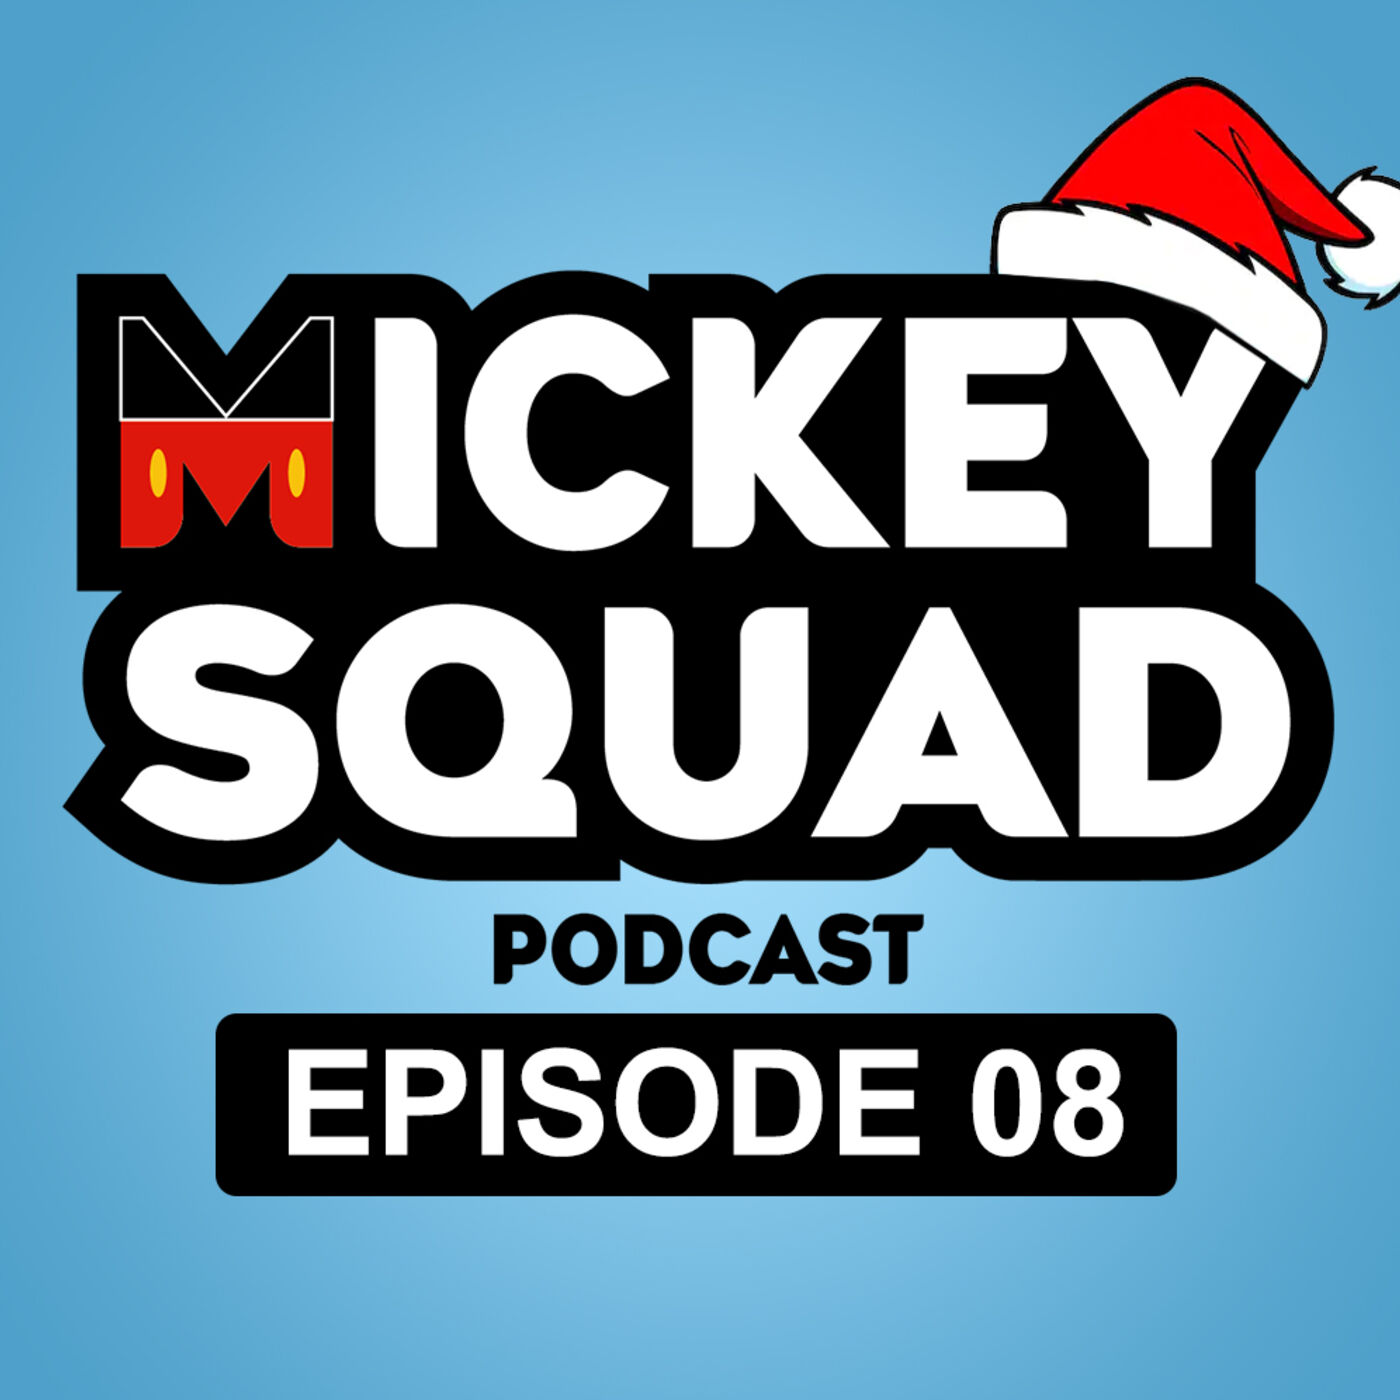 Episode 08 - Disneyland Calories Don't Count